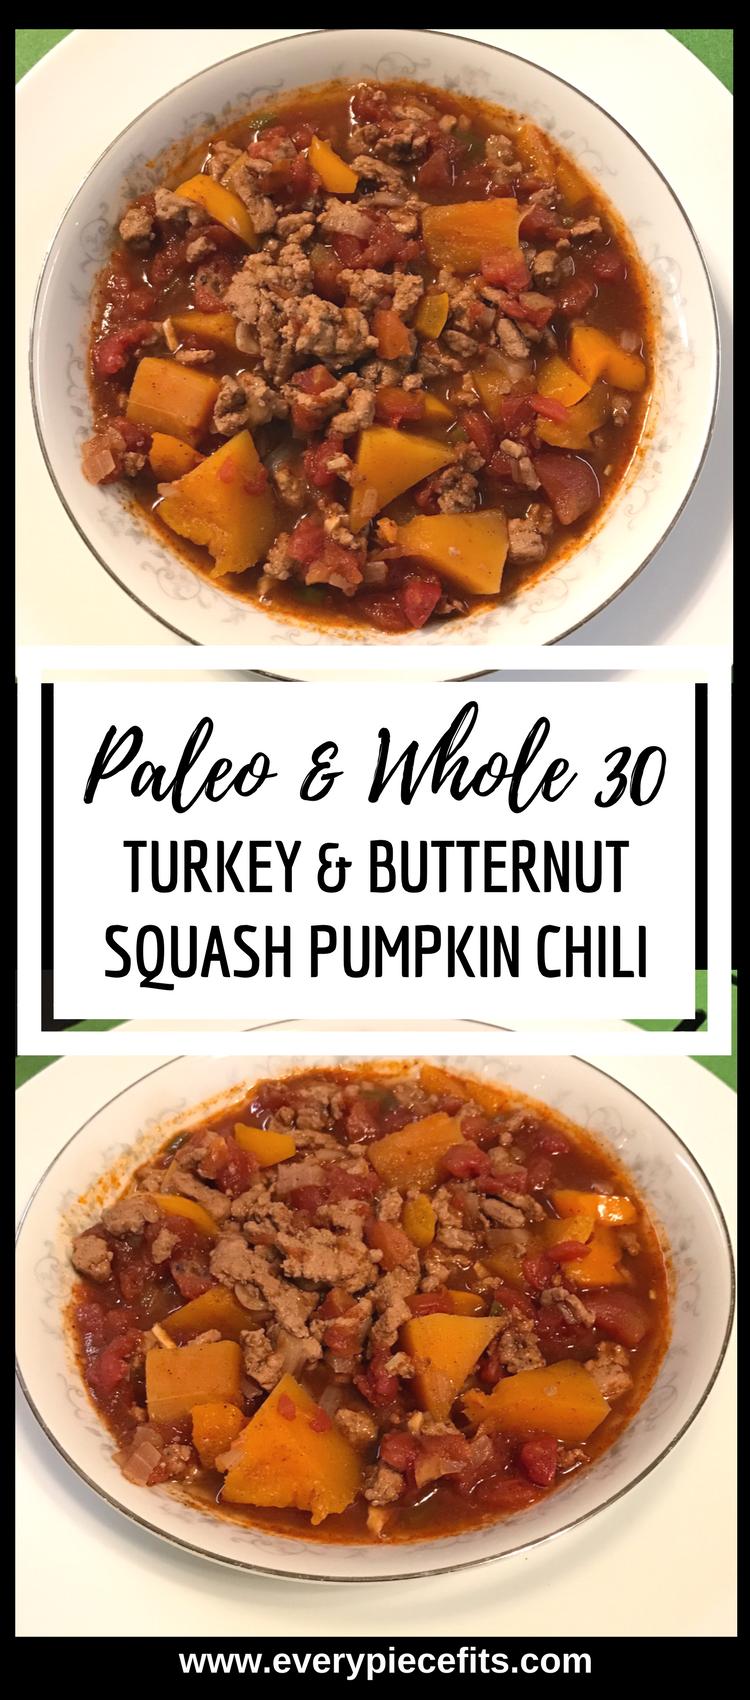 Pinterest Whole 30 Turkey Butternut Squash Pumpkin Chili.png